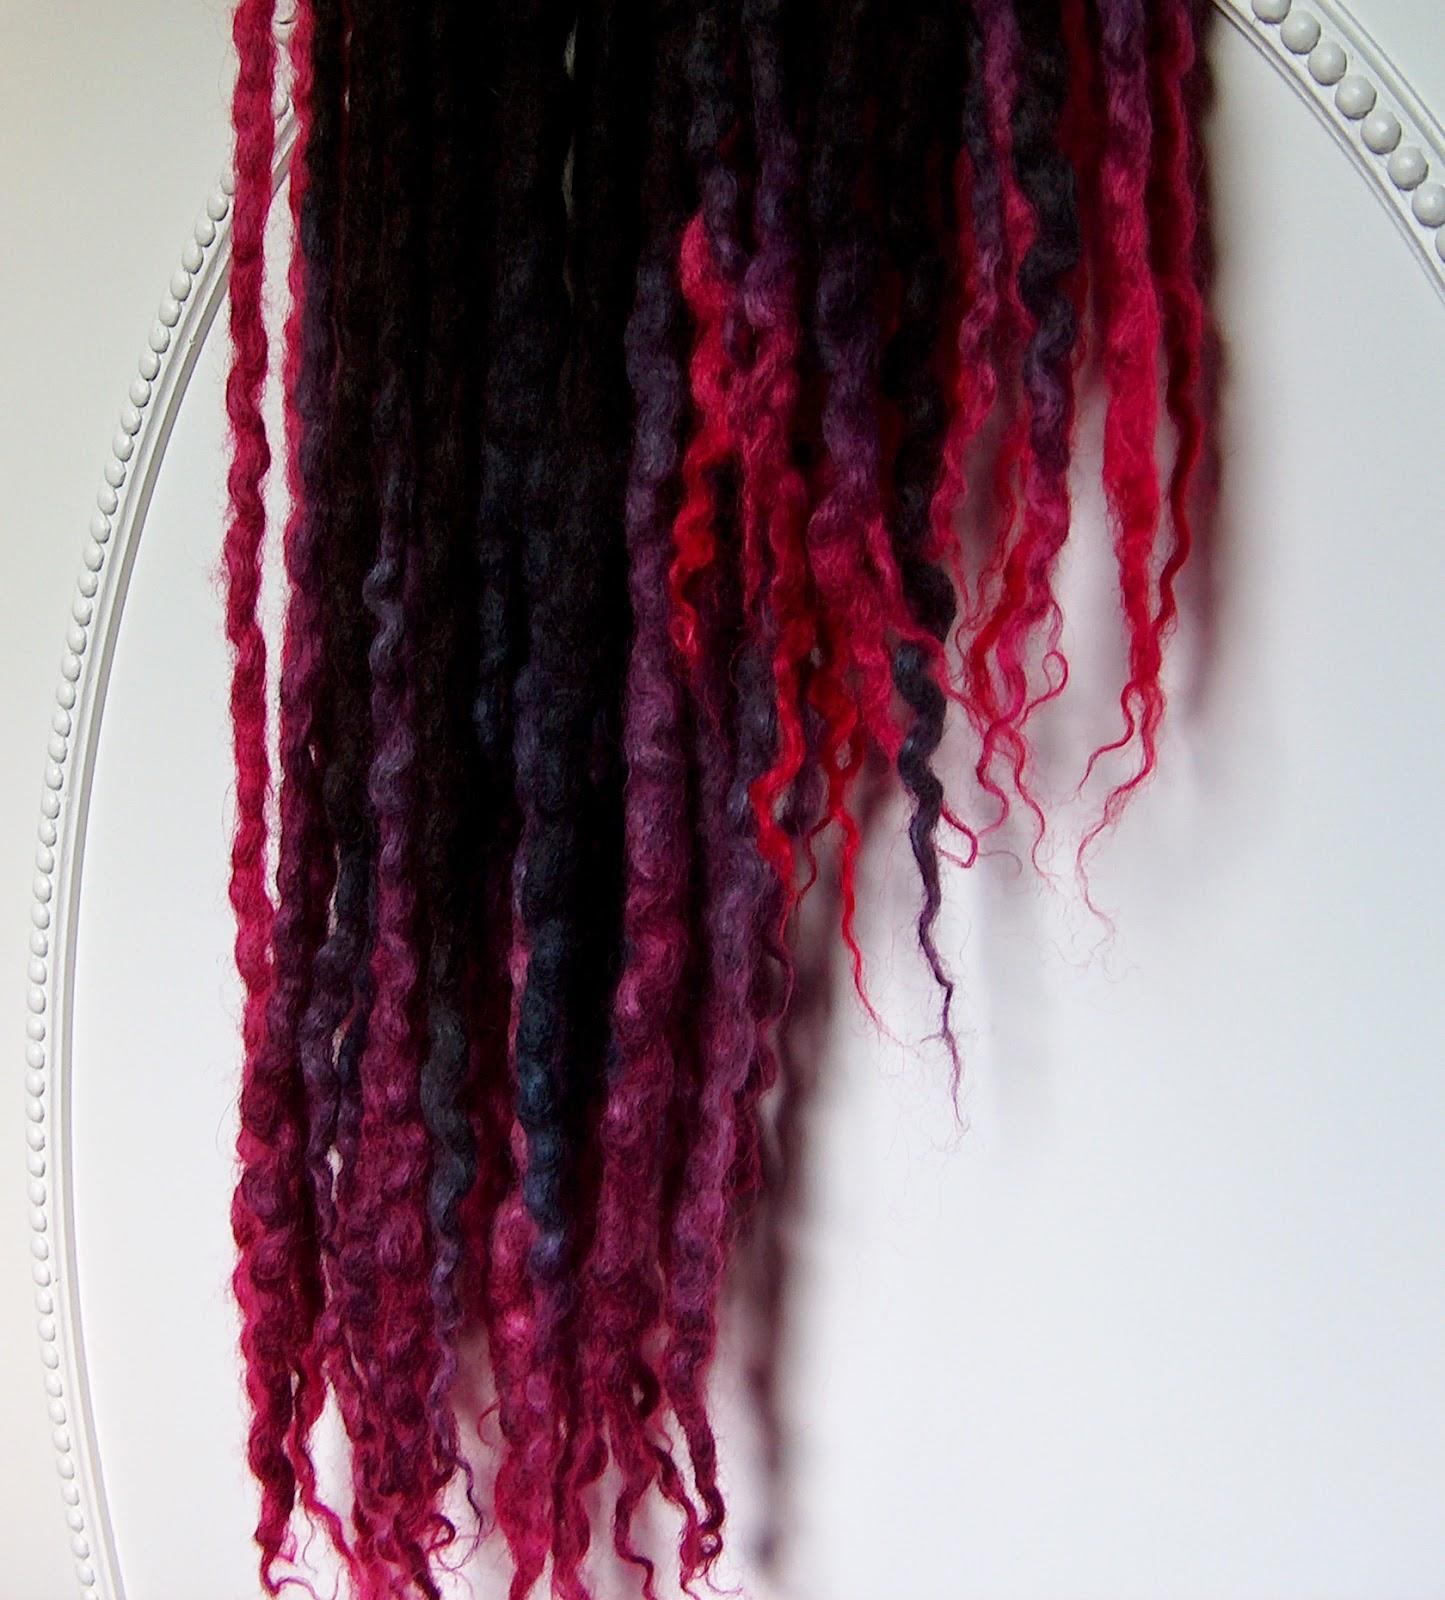 Hair Extensions Cyberlox Dreadfalls Fringe Synthetic Hair